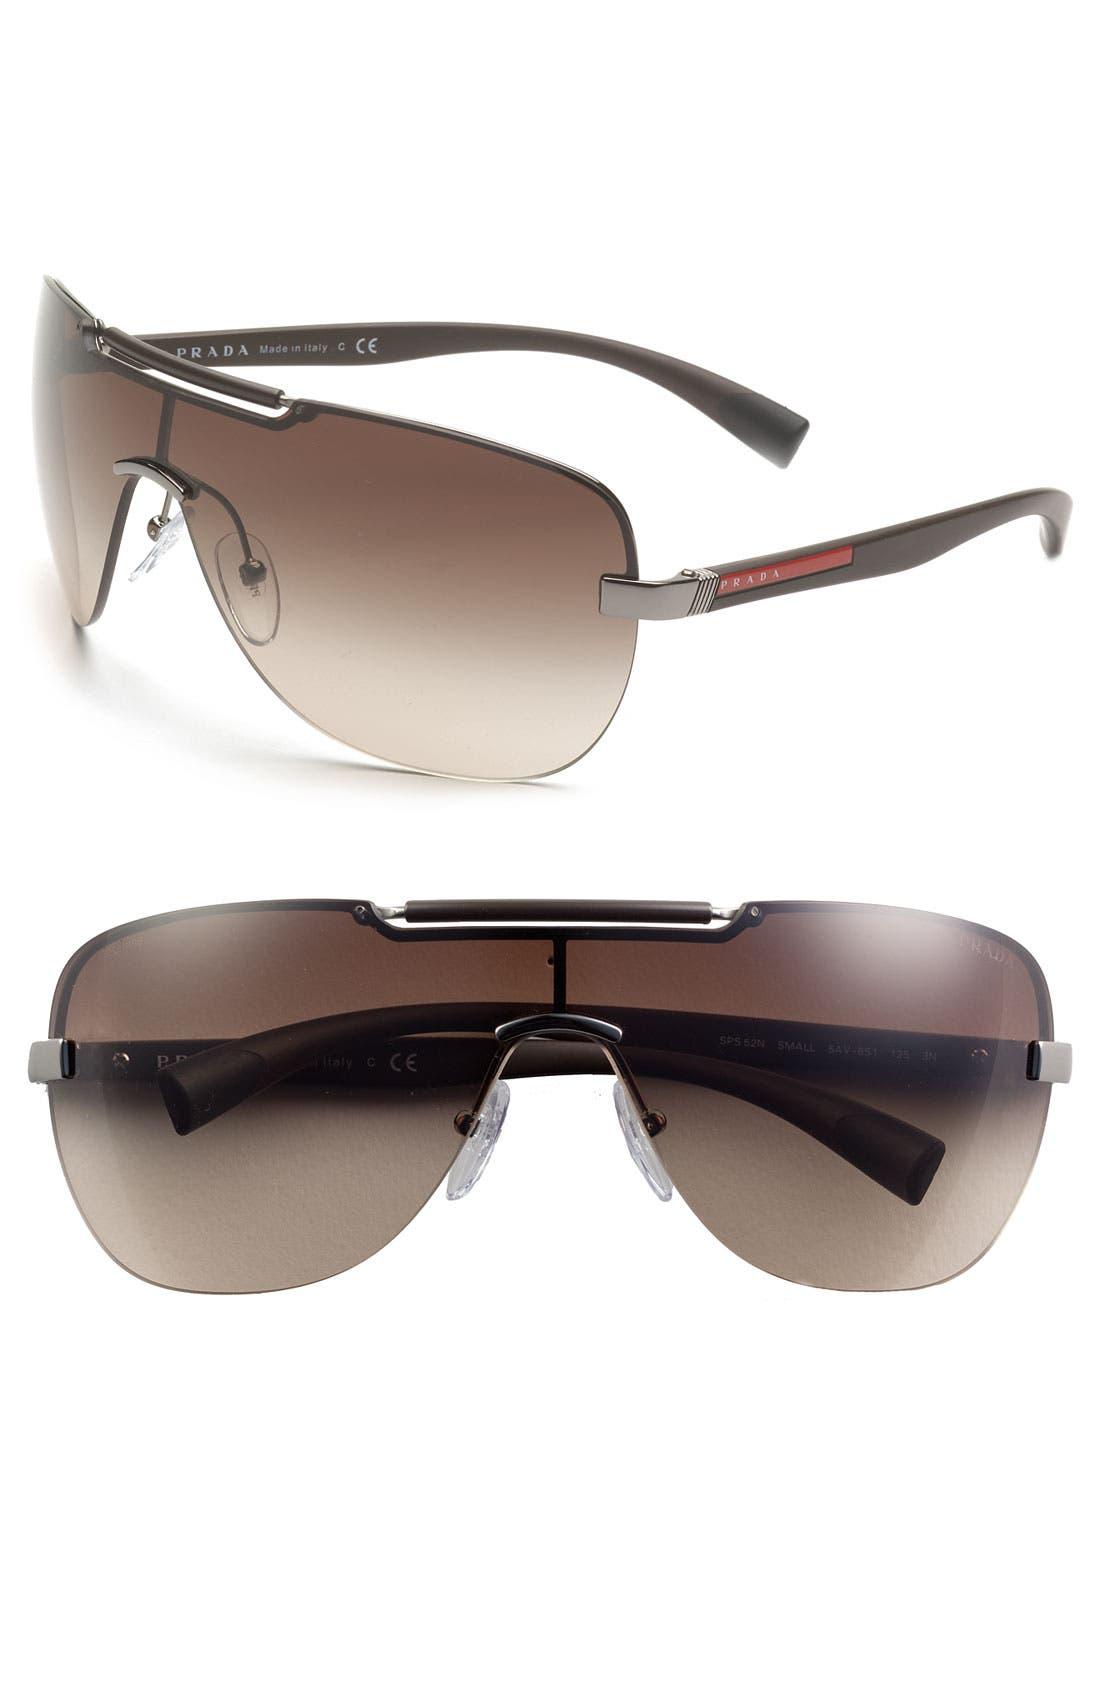 Main Image - Prada Shield Sunglasses